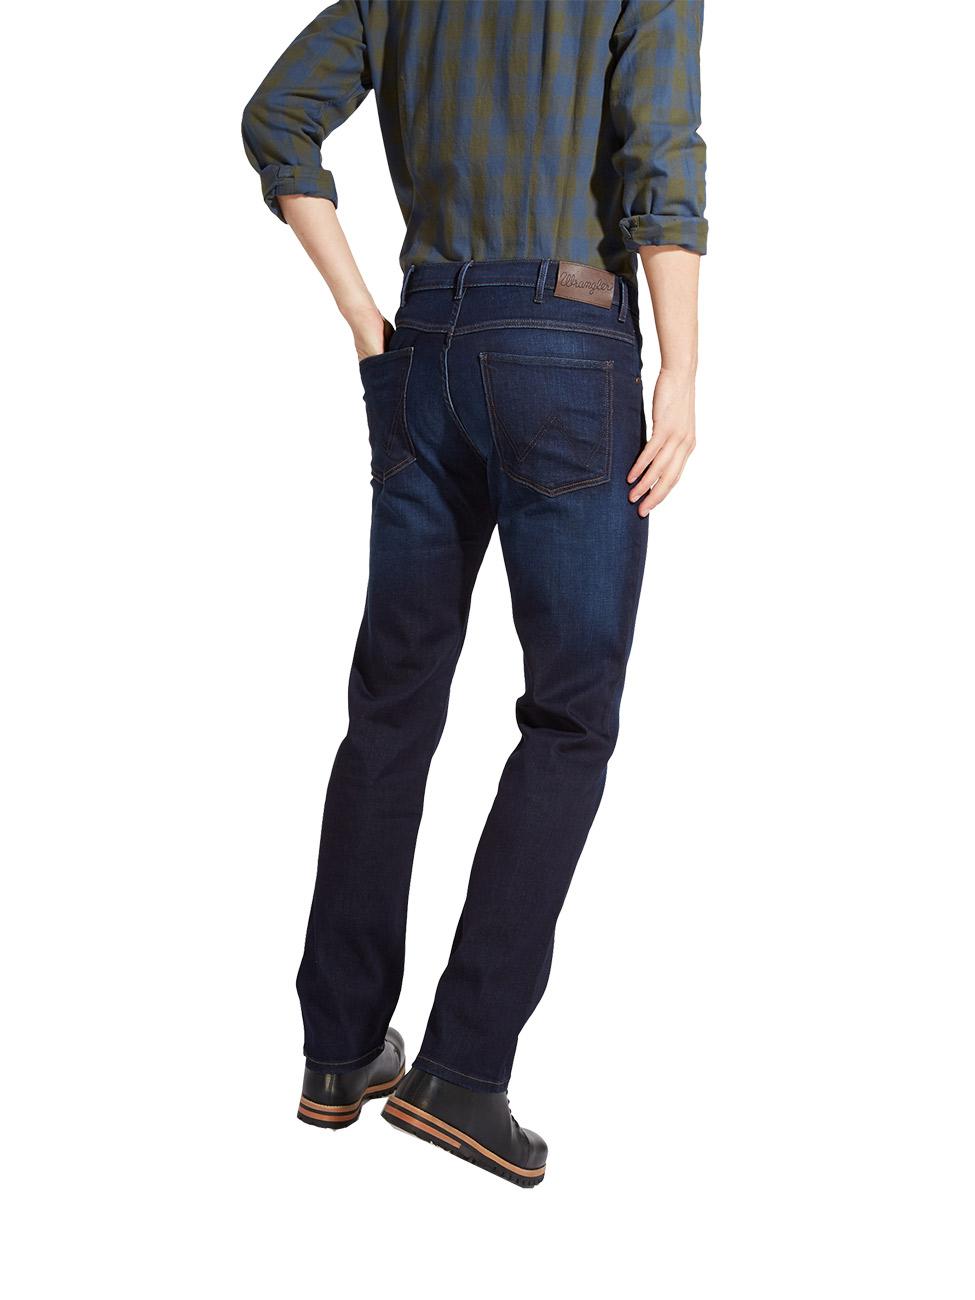 wrangler-herren-jeans-arizona-regular-fit-blau-blue-stroke